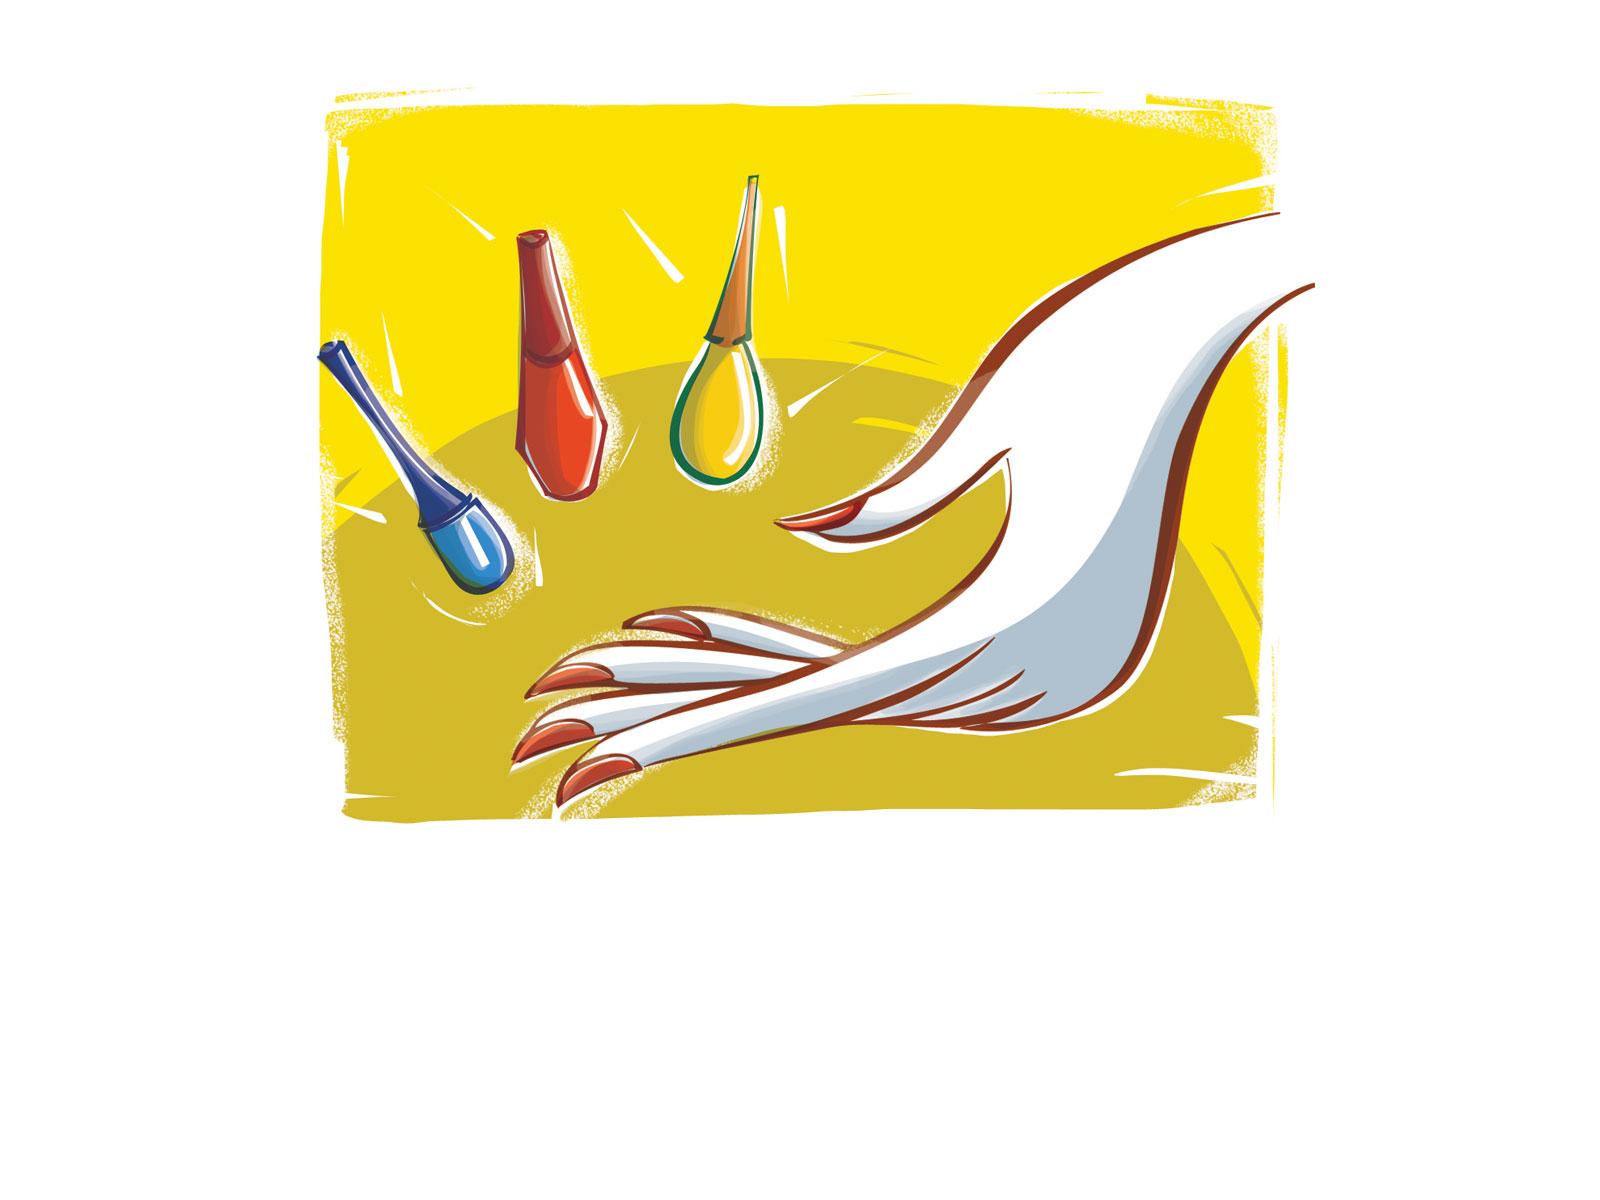 illustrations-beatricefavereau-1372